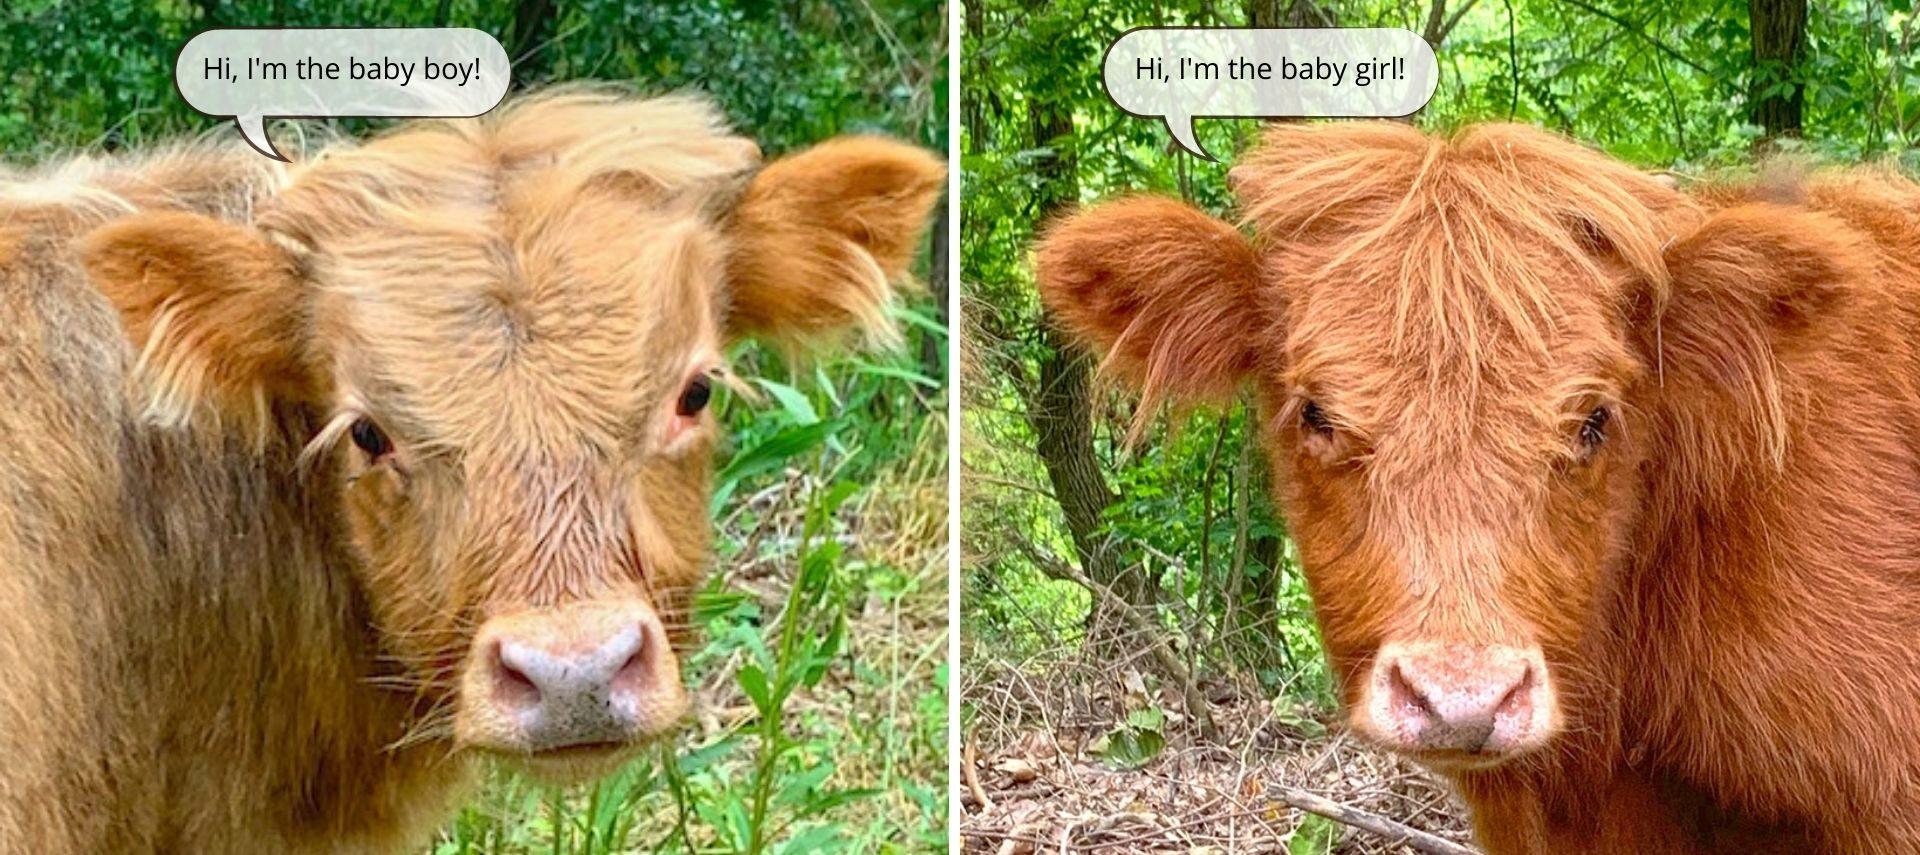 A tan boy cow calf and reddish brown girl cow calf